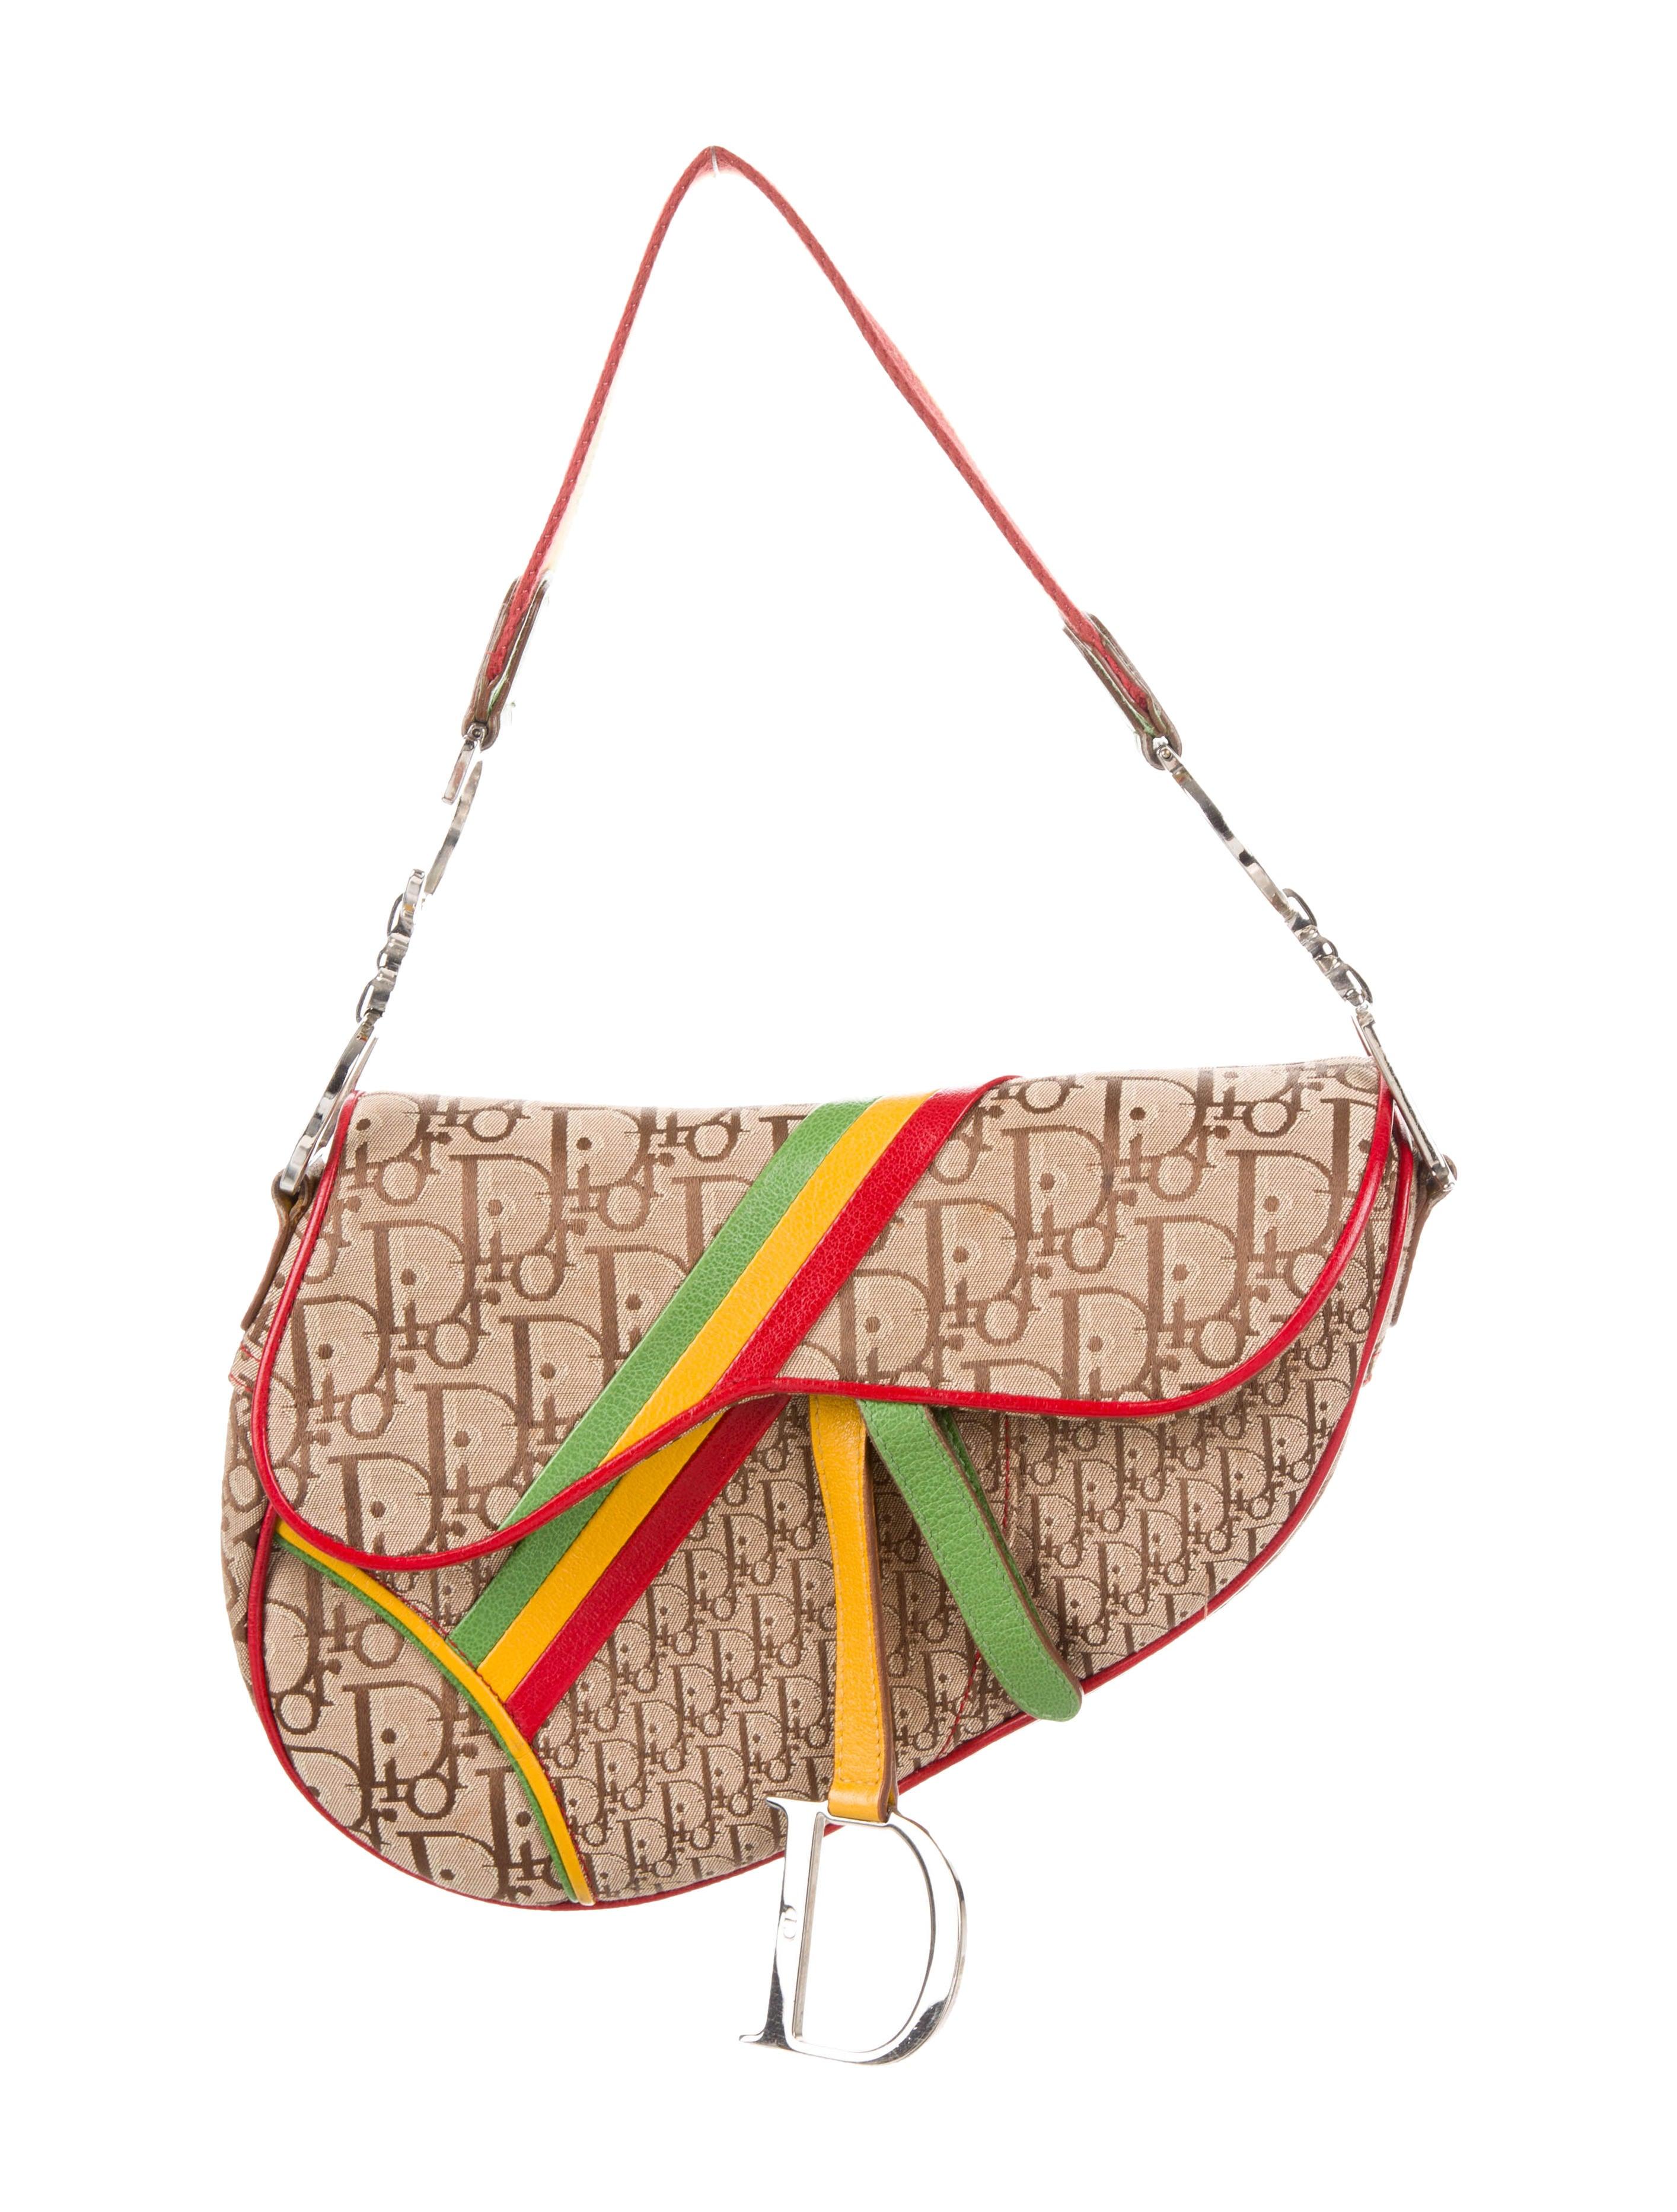 1860563fd6b3 Christian Dior Diorissimo Rasta Saddle Bag - Handbags - CHR67911 ...